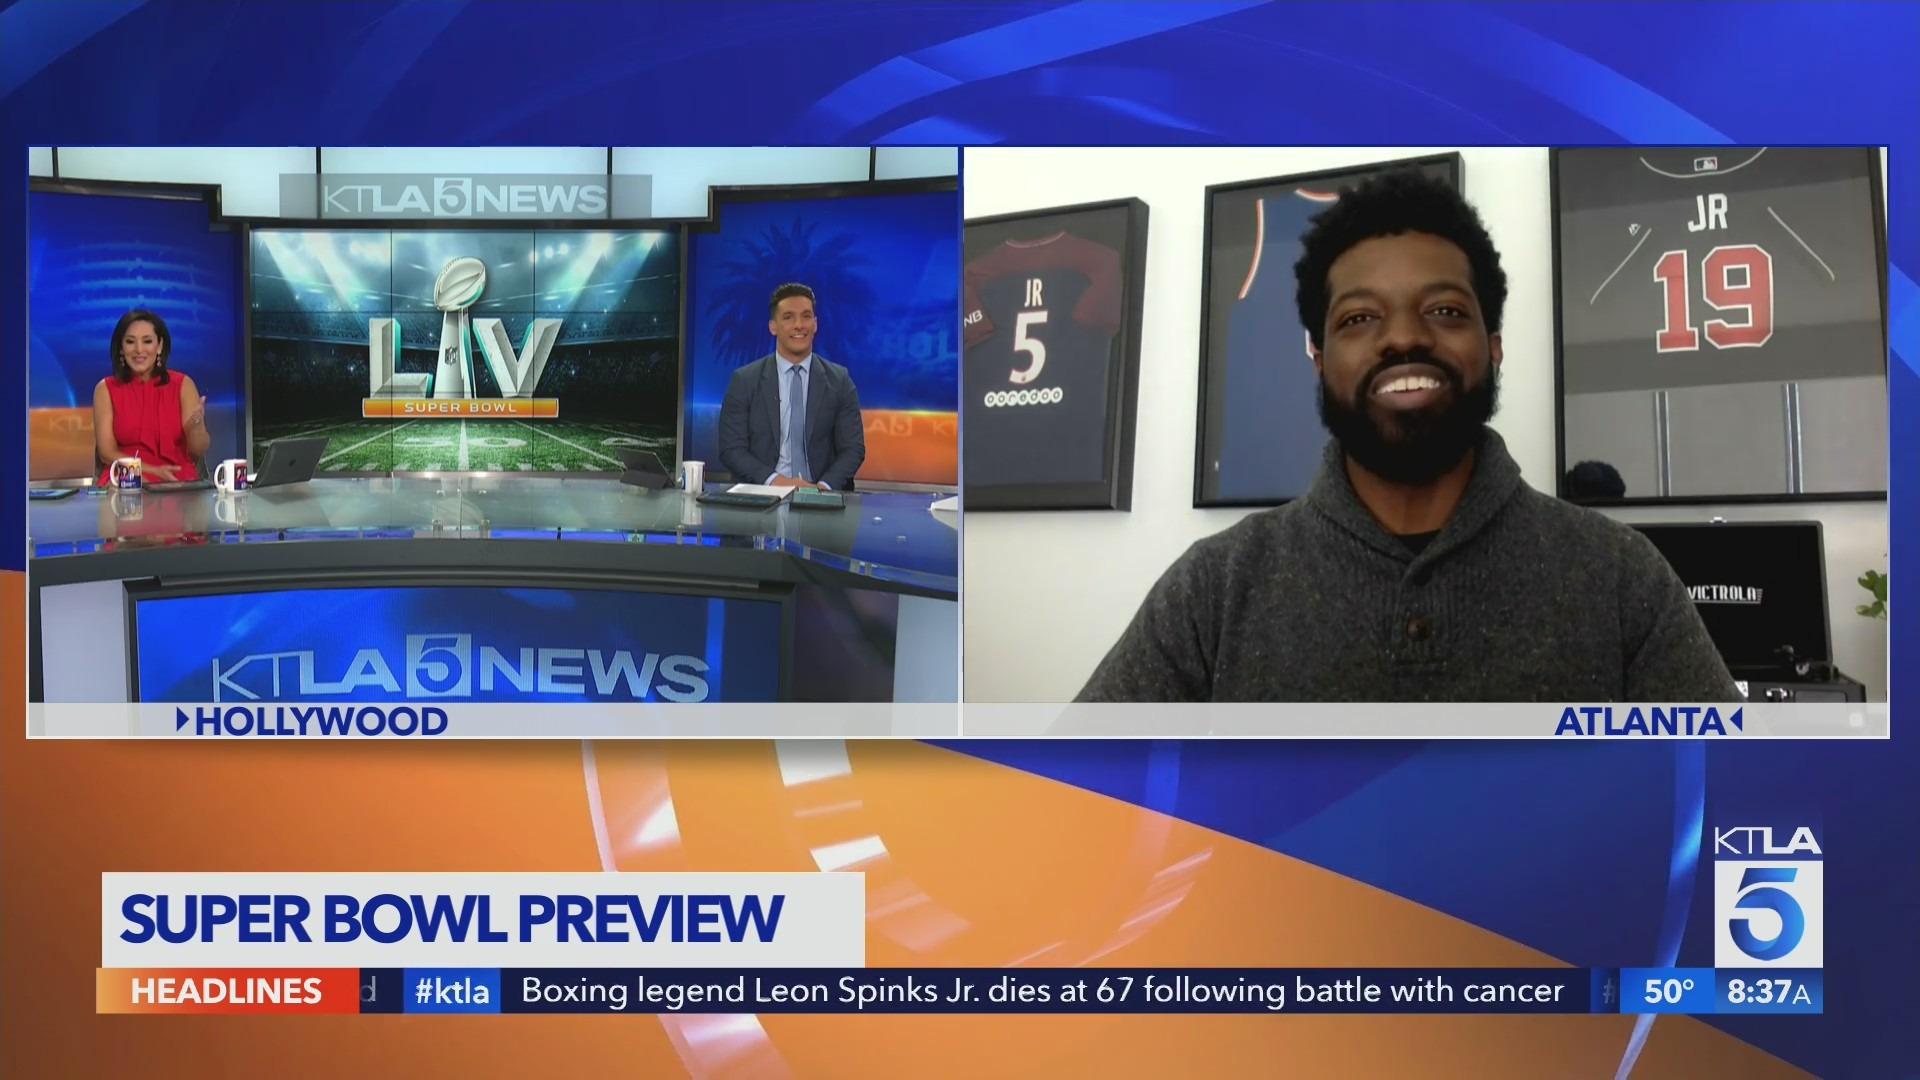 J.R. Jackson previews Super Bowl LV